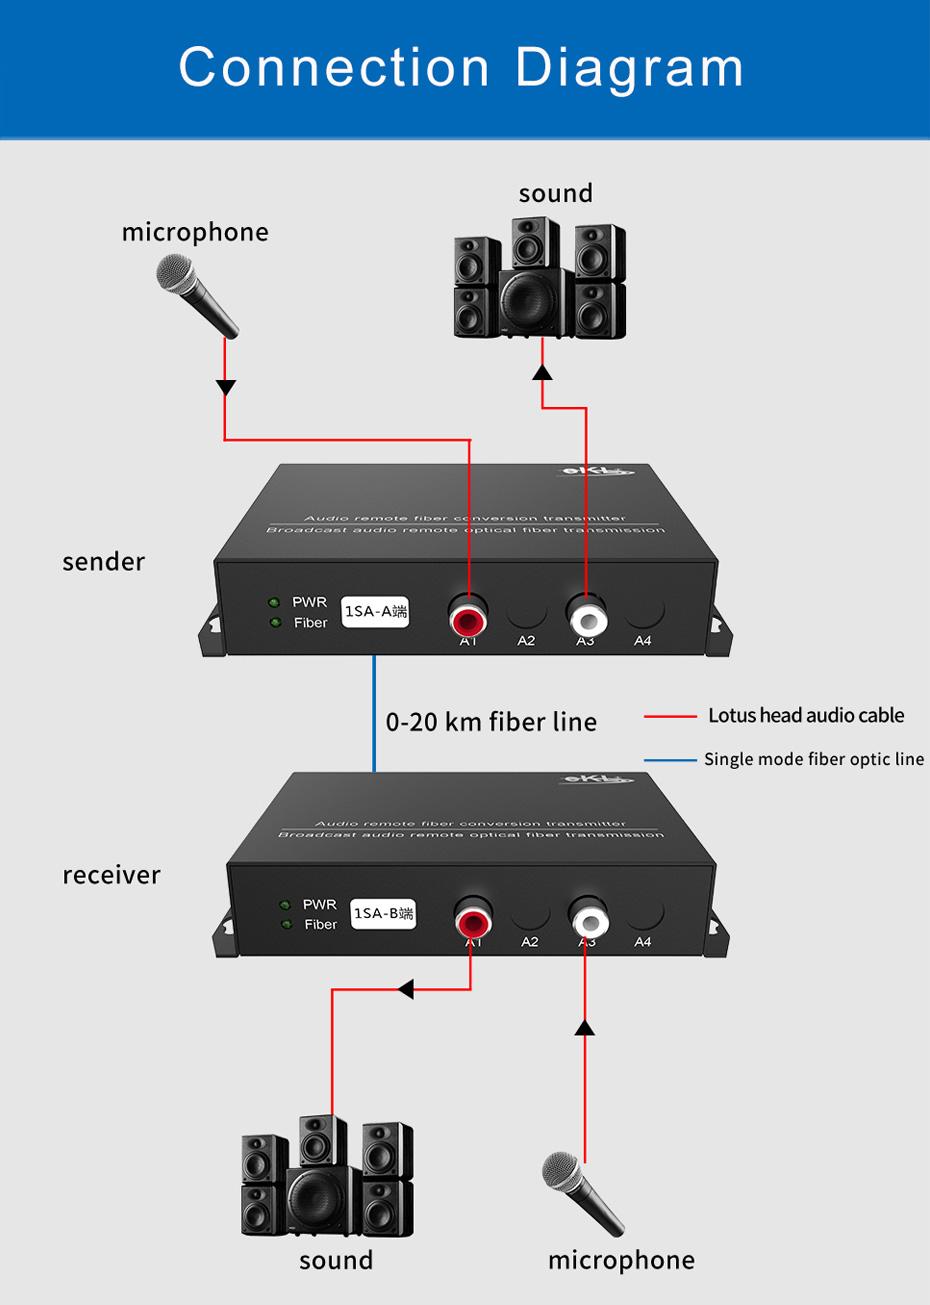 Diagram of Audio optical transceiver 1SA Connection